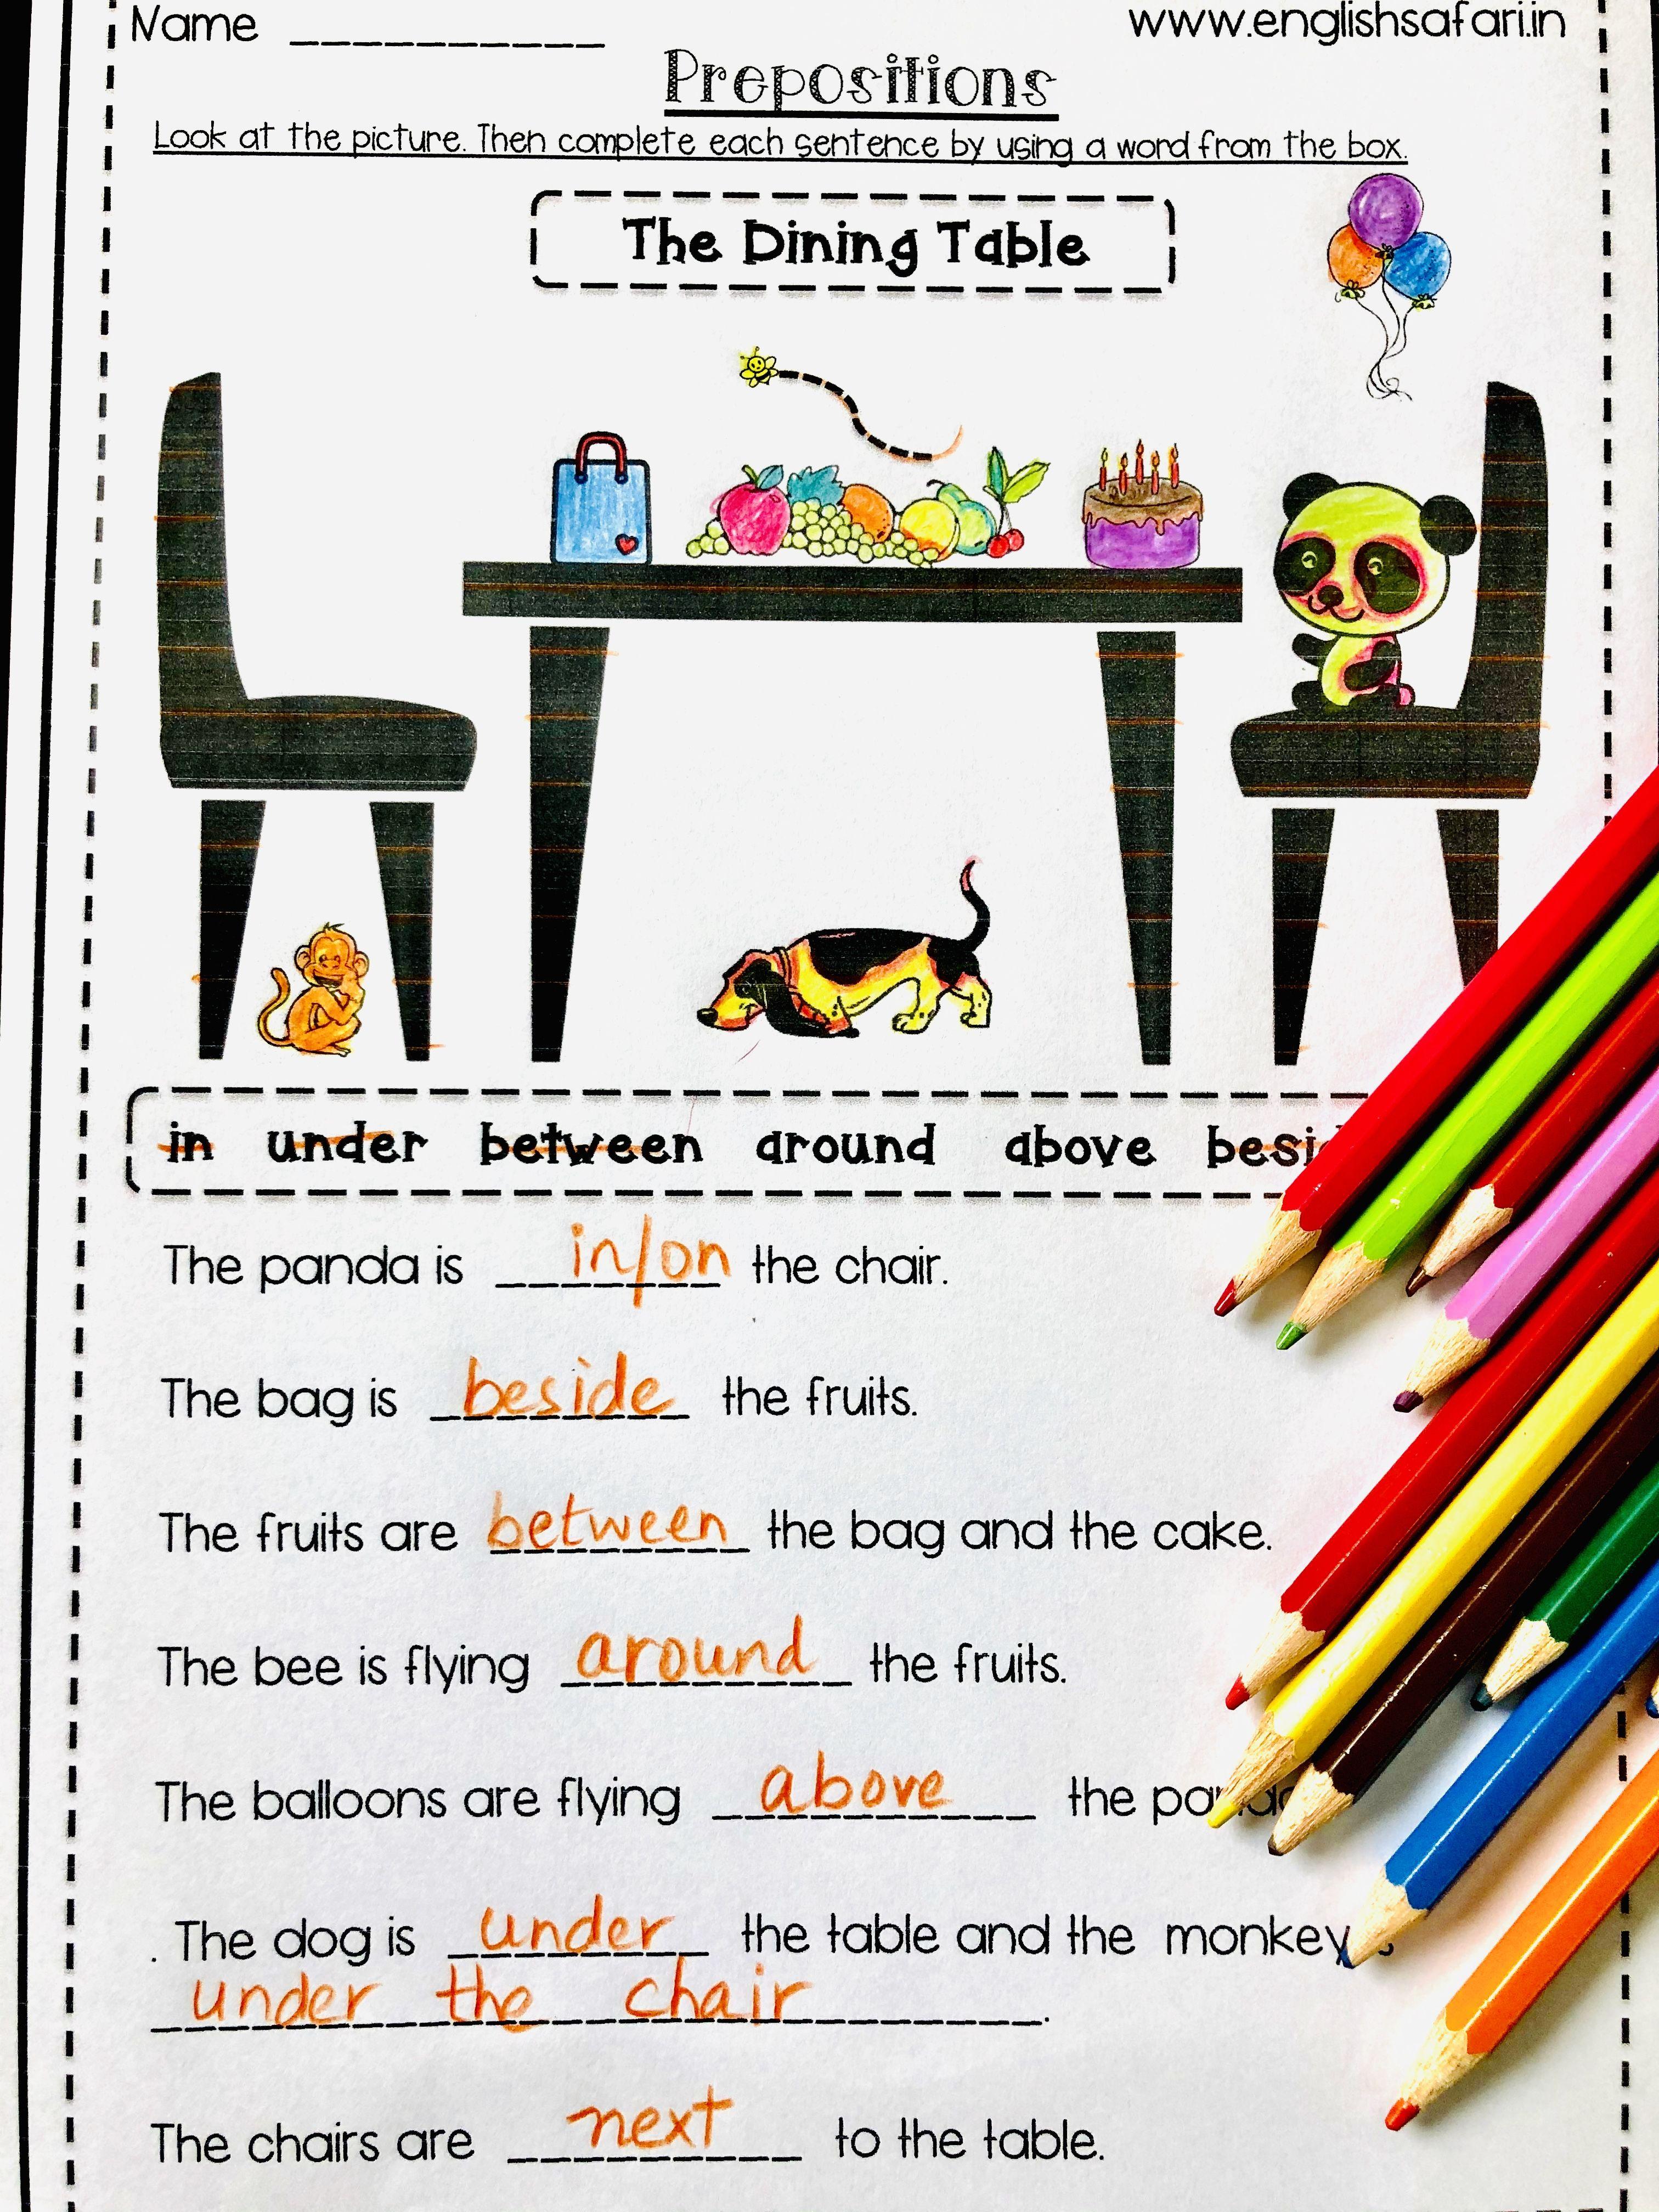 FREE** prepositions worksheet www.englishsafari.in   Preposition worksheets [ 4032 x 3024 Pixel ]